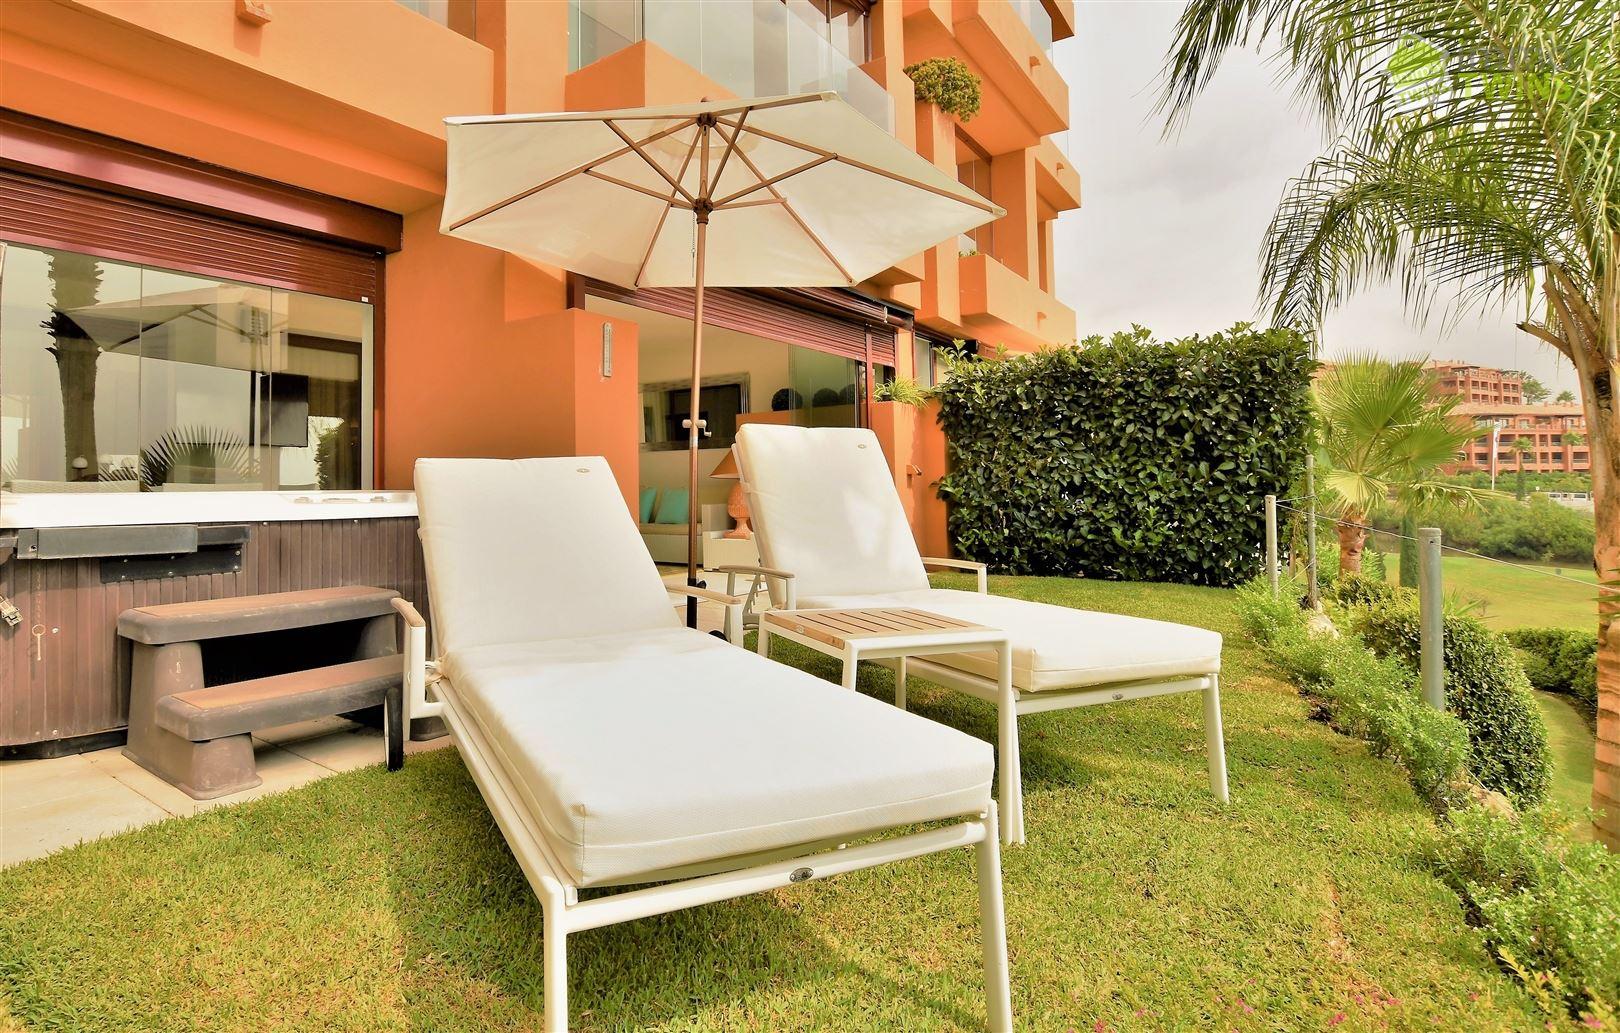 Foto 11 : Appartement te 29679 MARBELLA (Spanje) - Prijs € 485.000